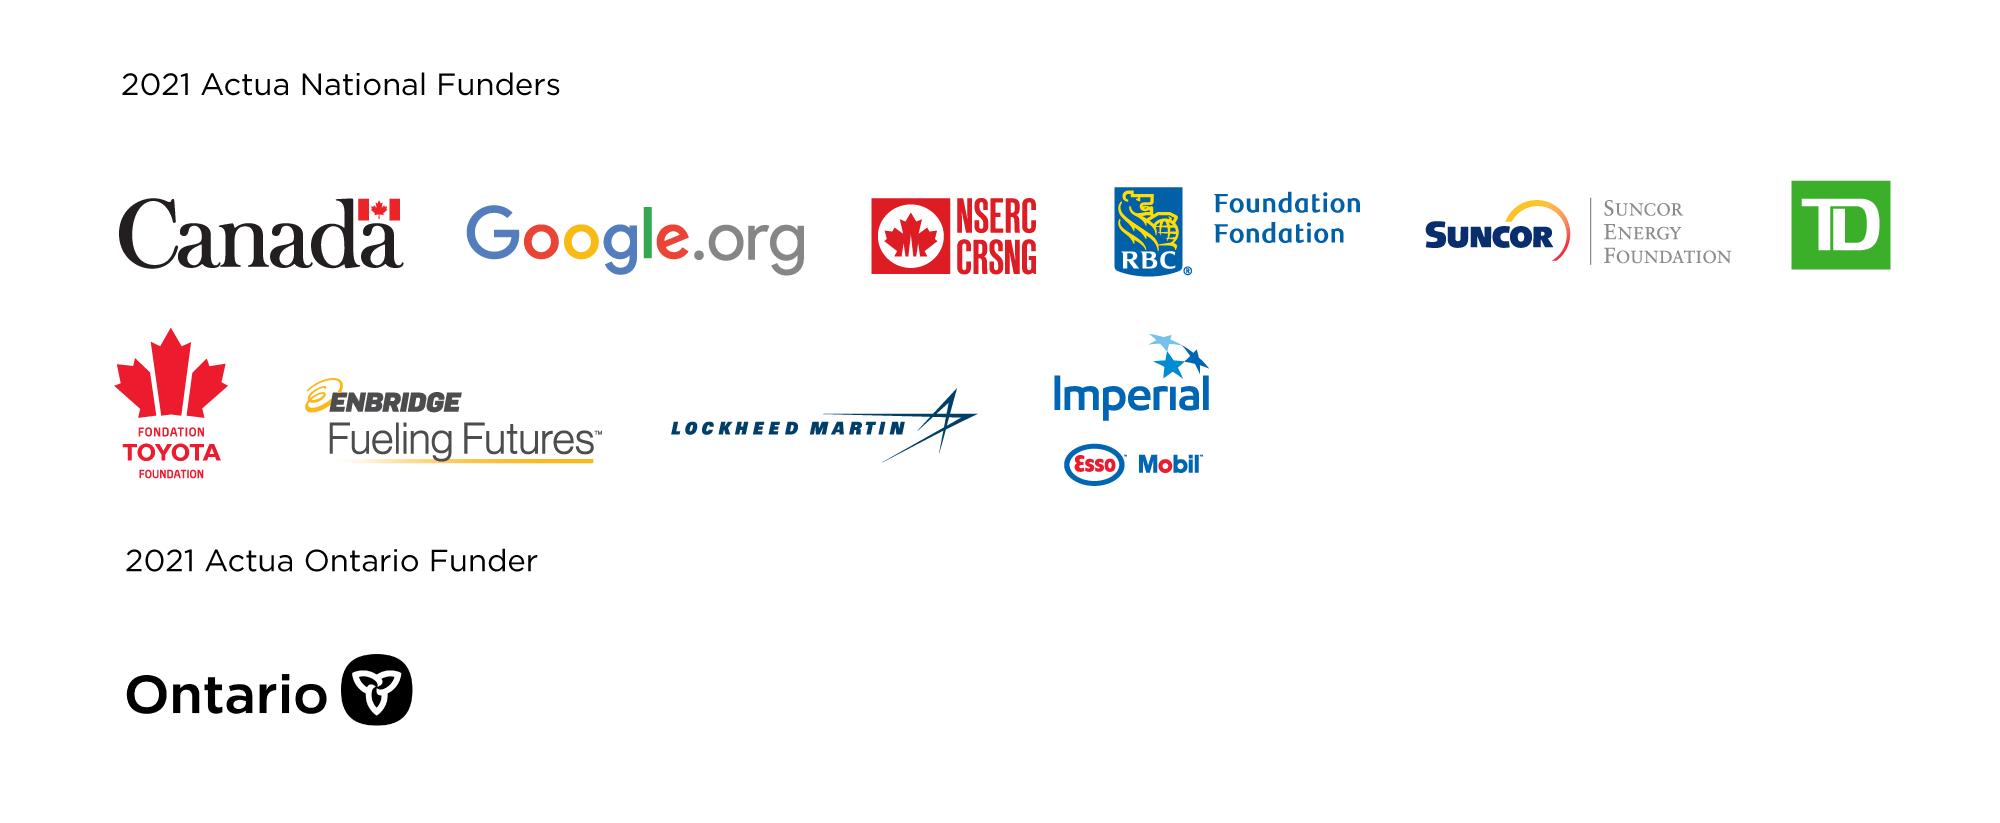 Actua National Funders 2021 - Logos are Canada, Google.org, NSERC, RBC Foundation, Suncor, TD, Toyota Foundation, Enbridge, Lockheed Martin, Imperial Esso Mobil